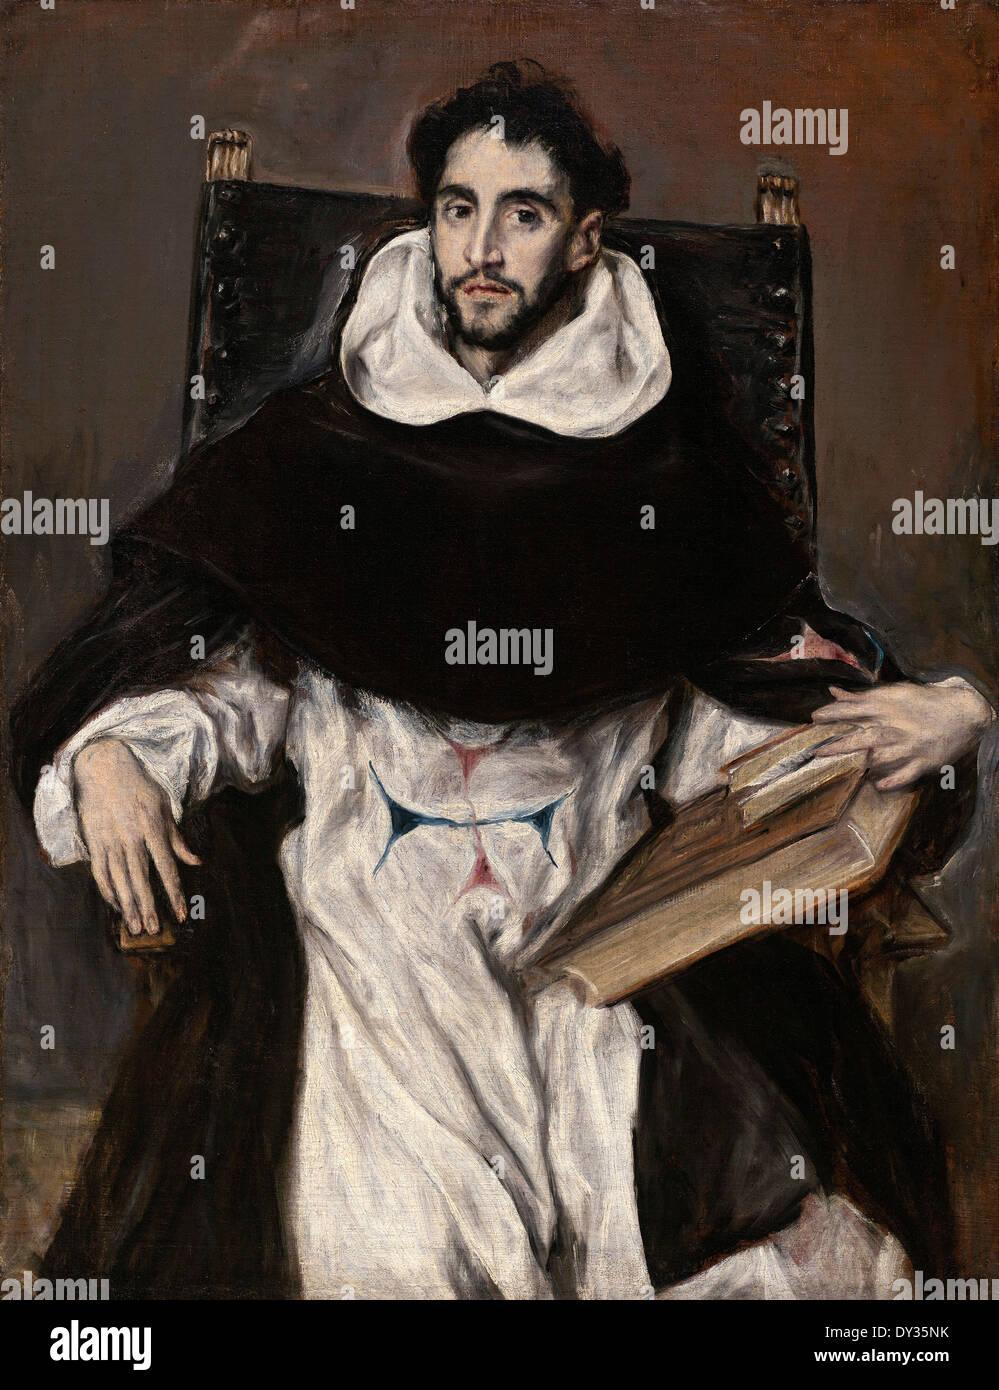 El Greco, Fray Hortensio Felix Paravicino 1609 Oil on canvas. Museum of Fine Arts Boston, USA. - Stock Image